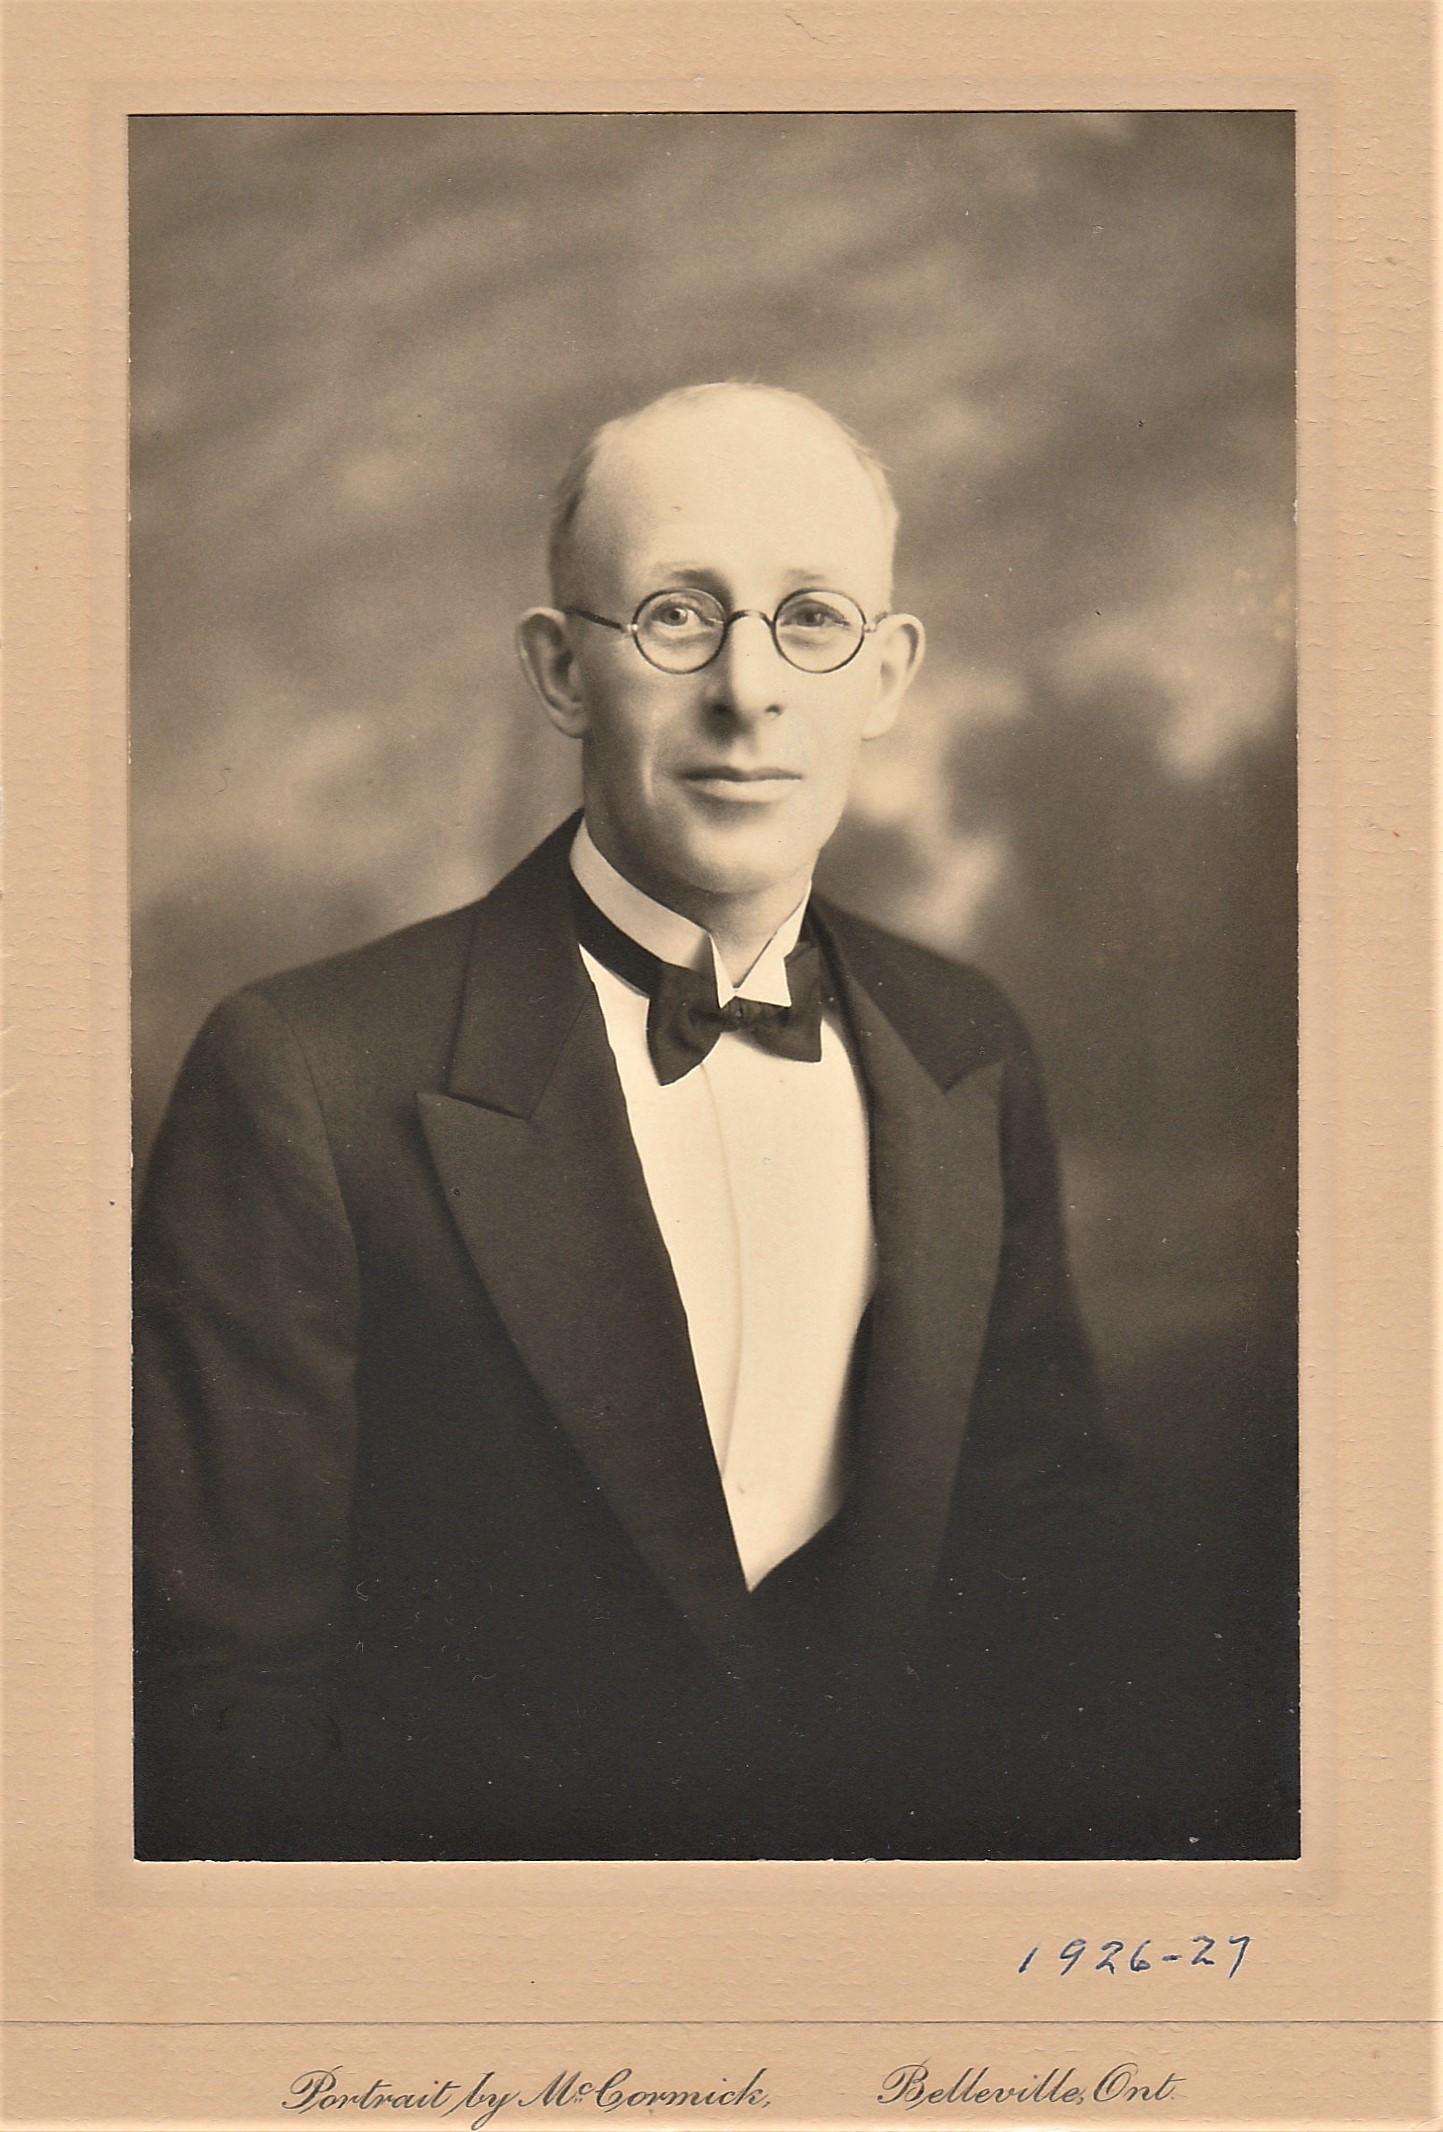 David Ernest Bell 1926-27.jpg